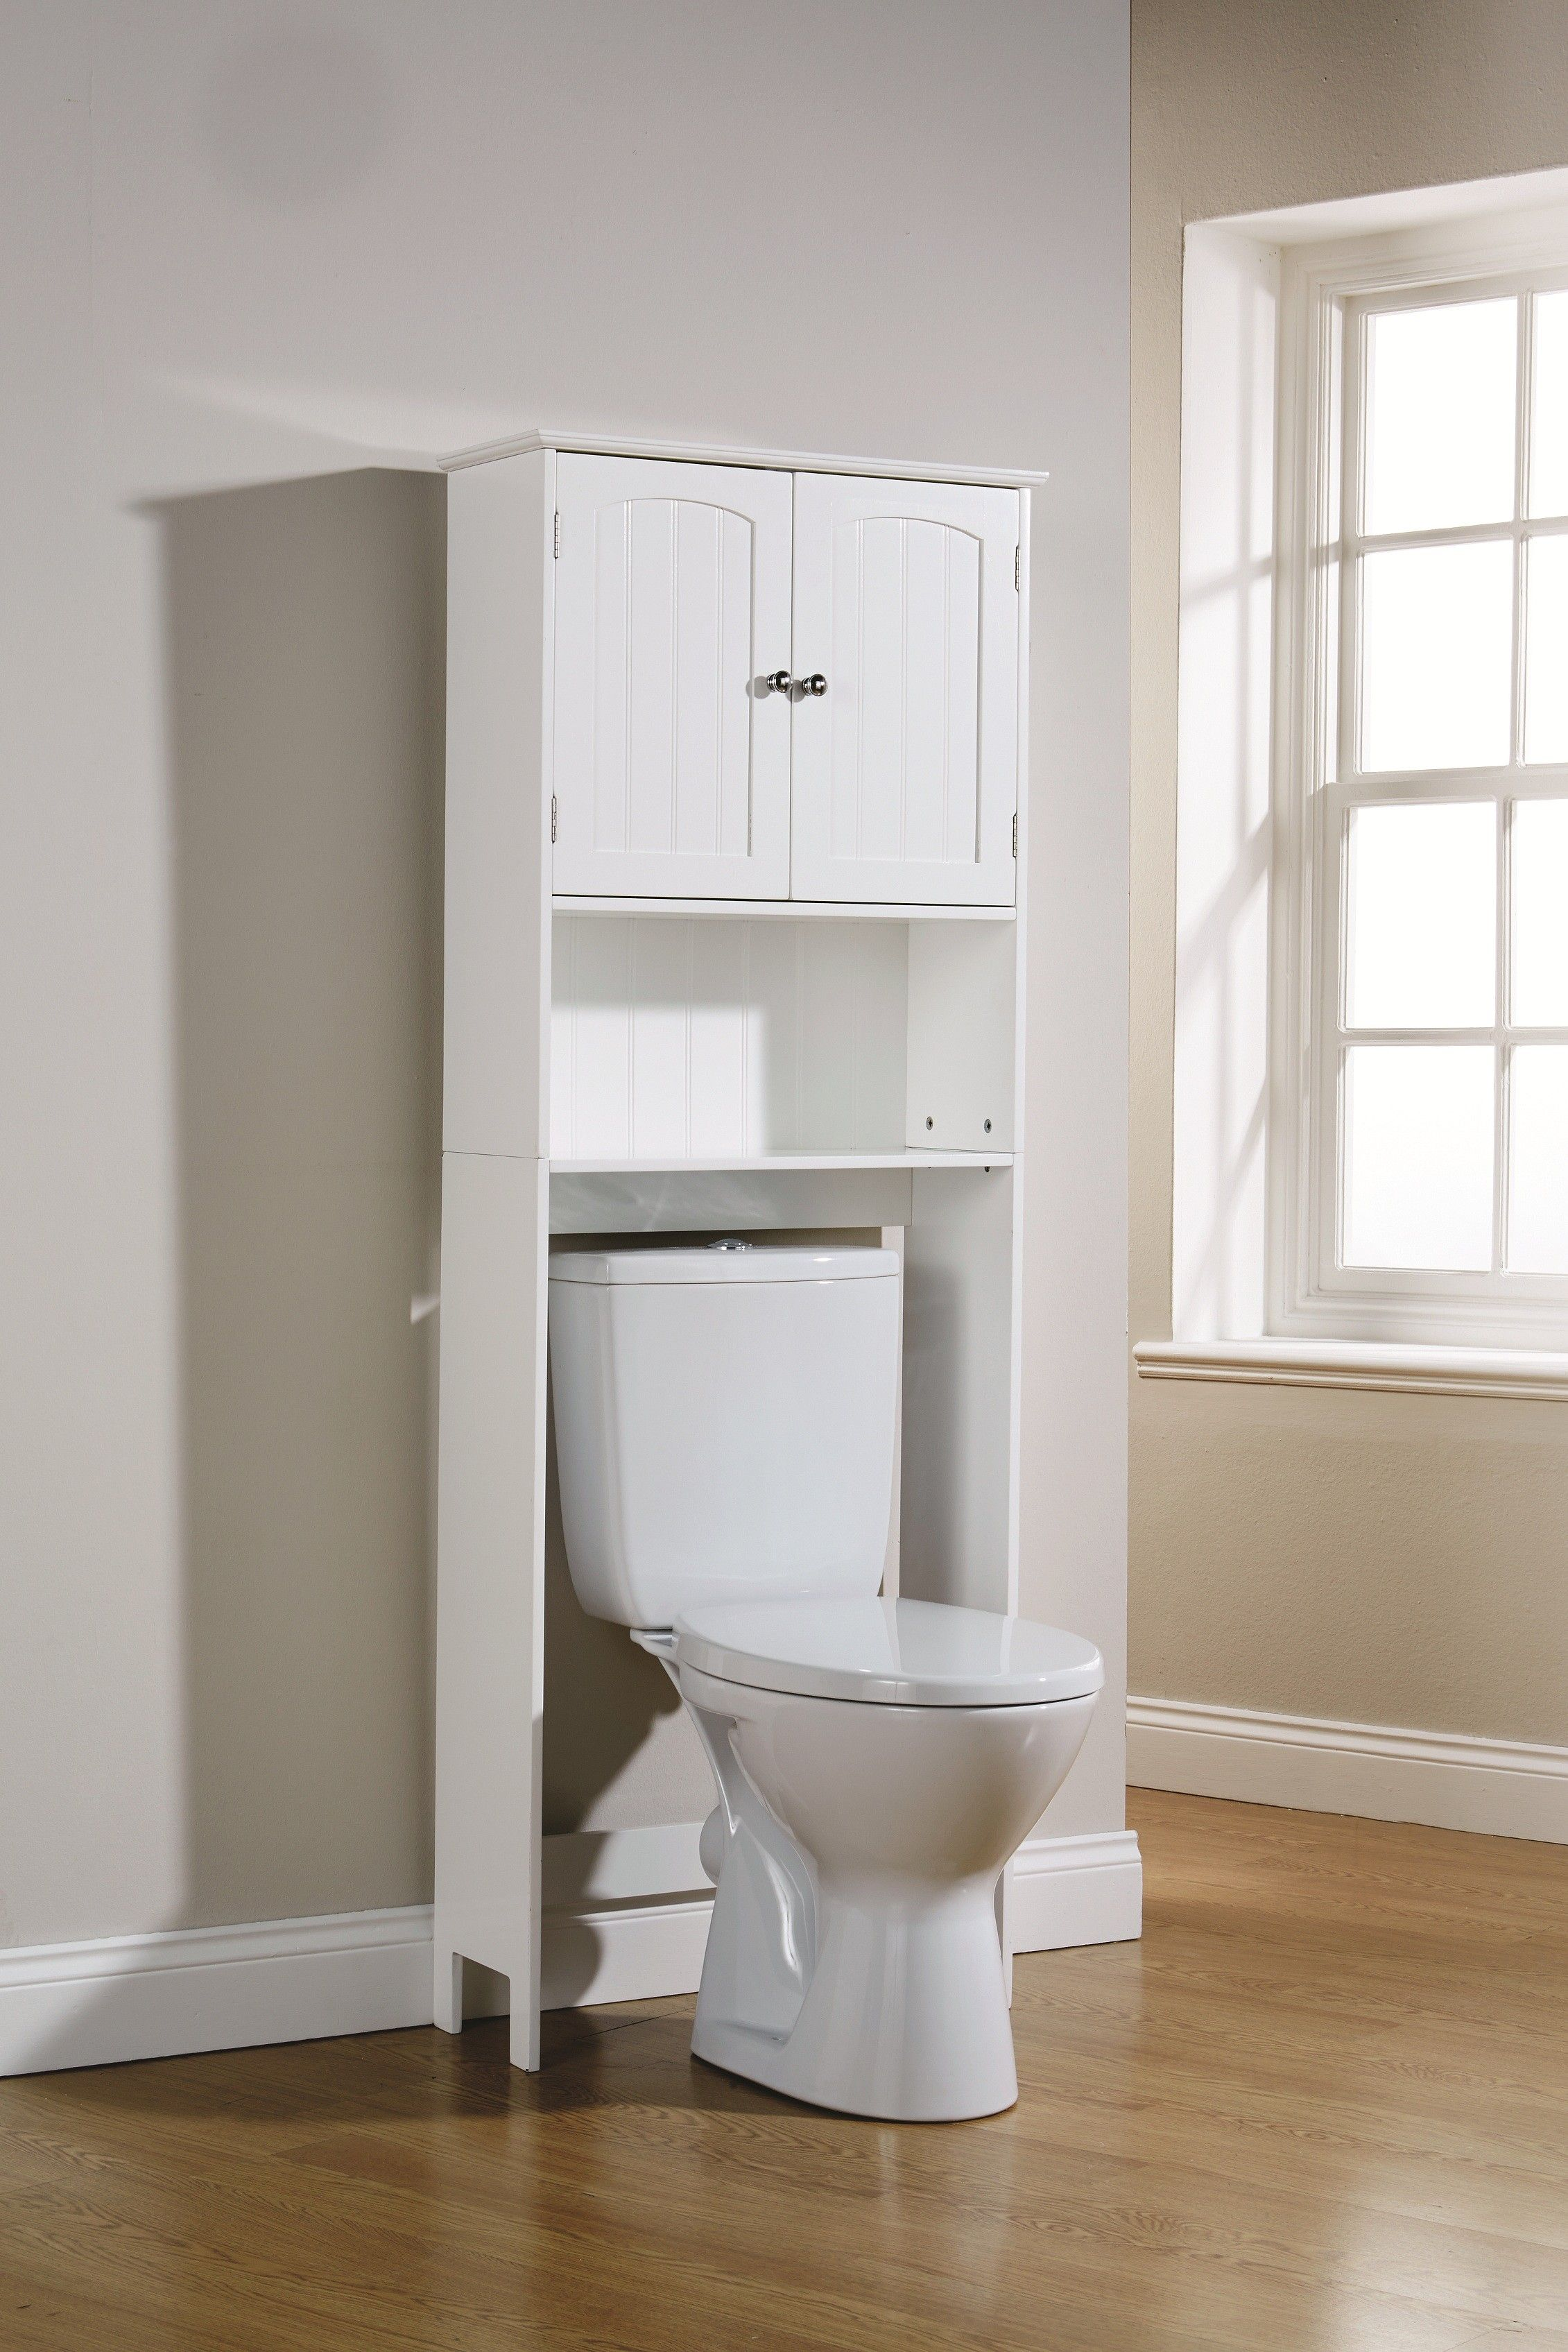 Latest Posts Under: Bathroom Etagere